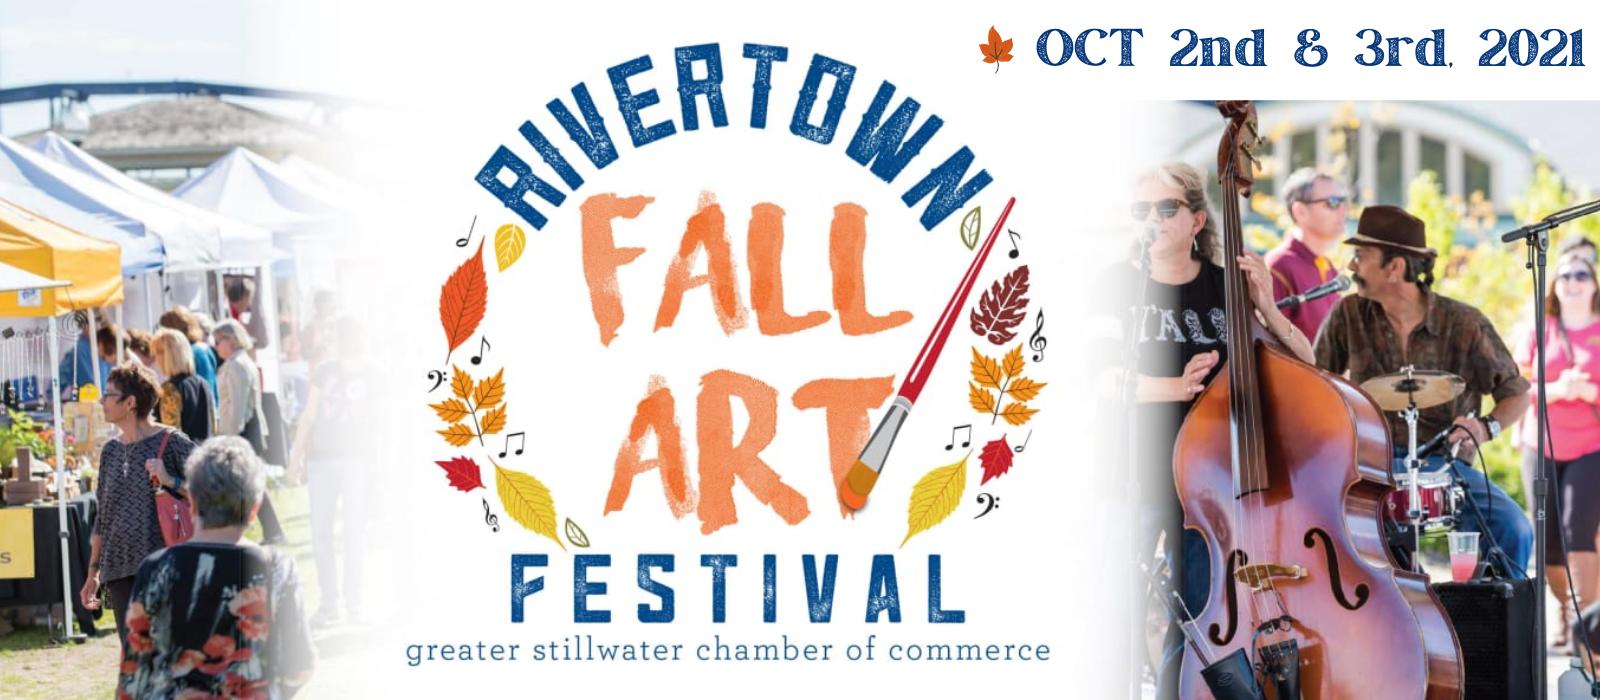 RIVERTOWN FALL ART FESTIVAL 2021